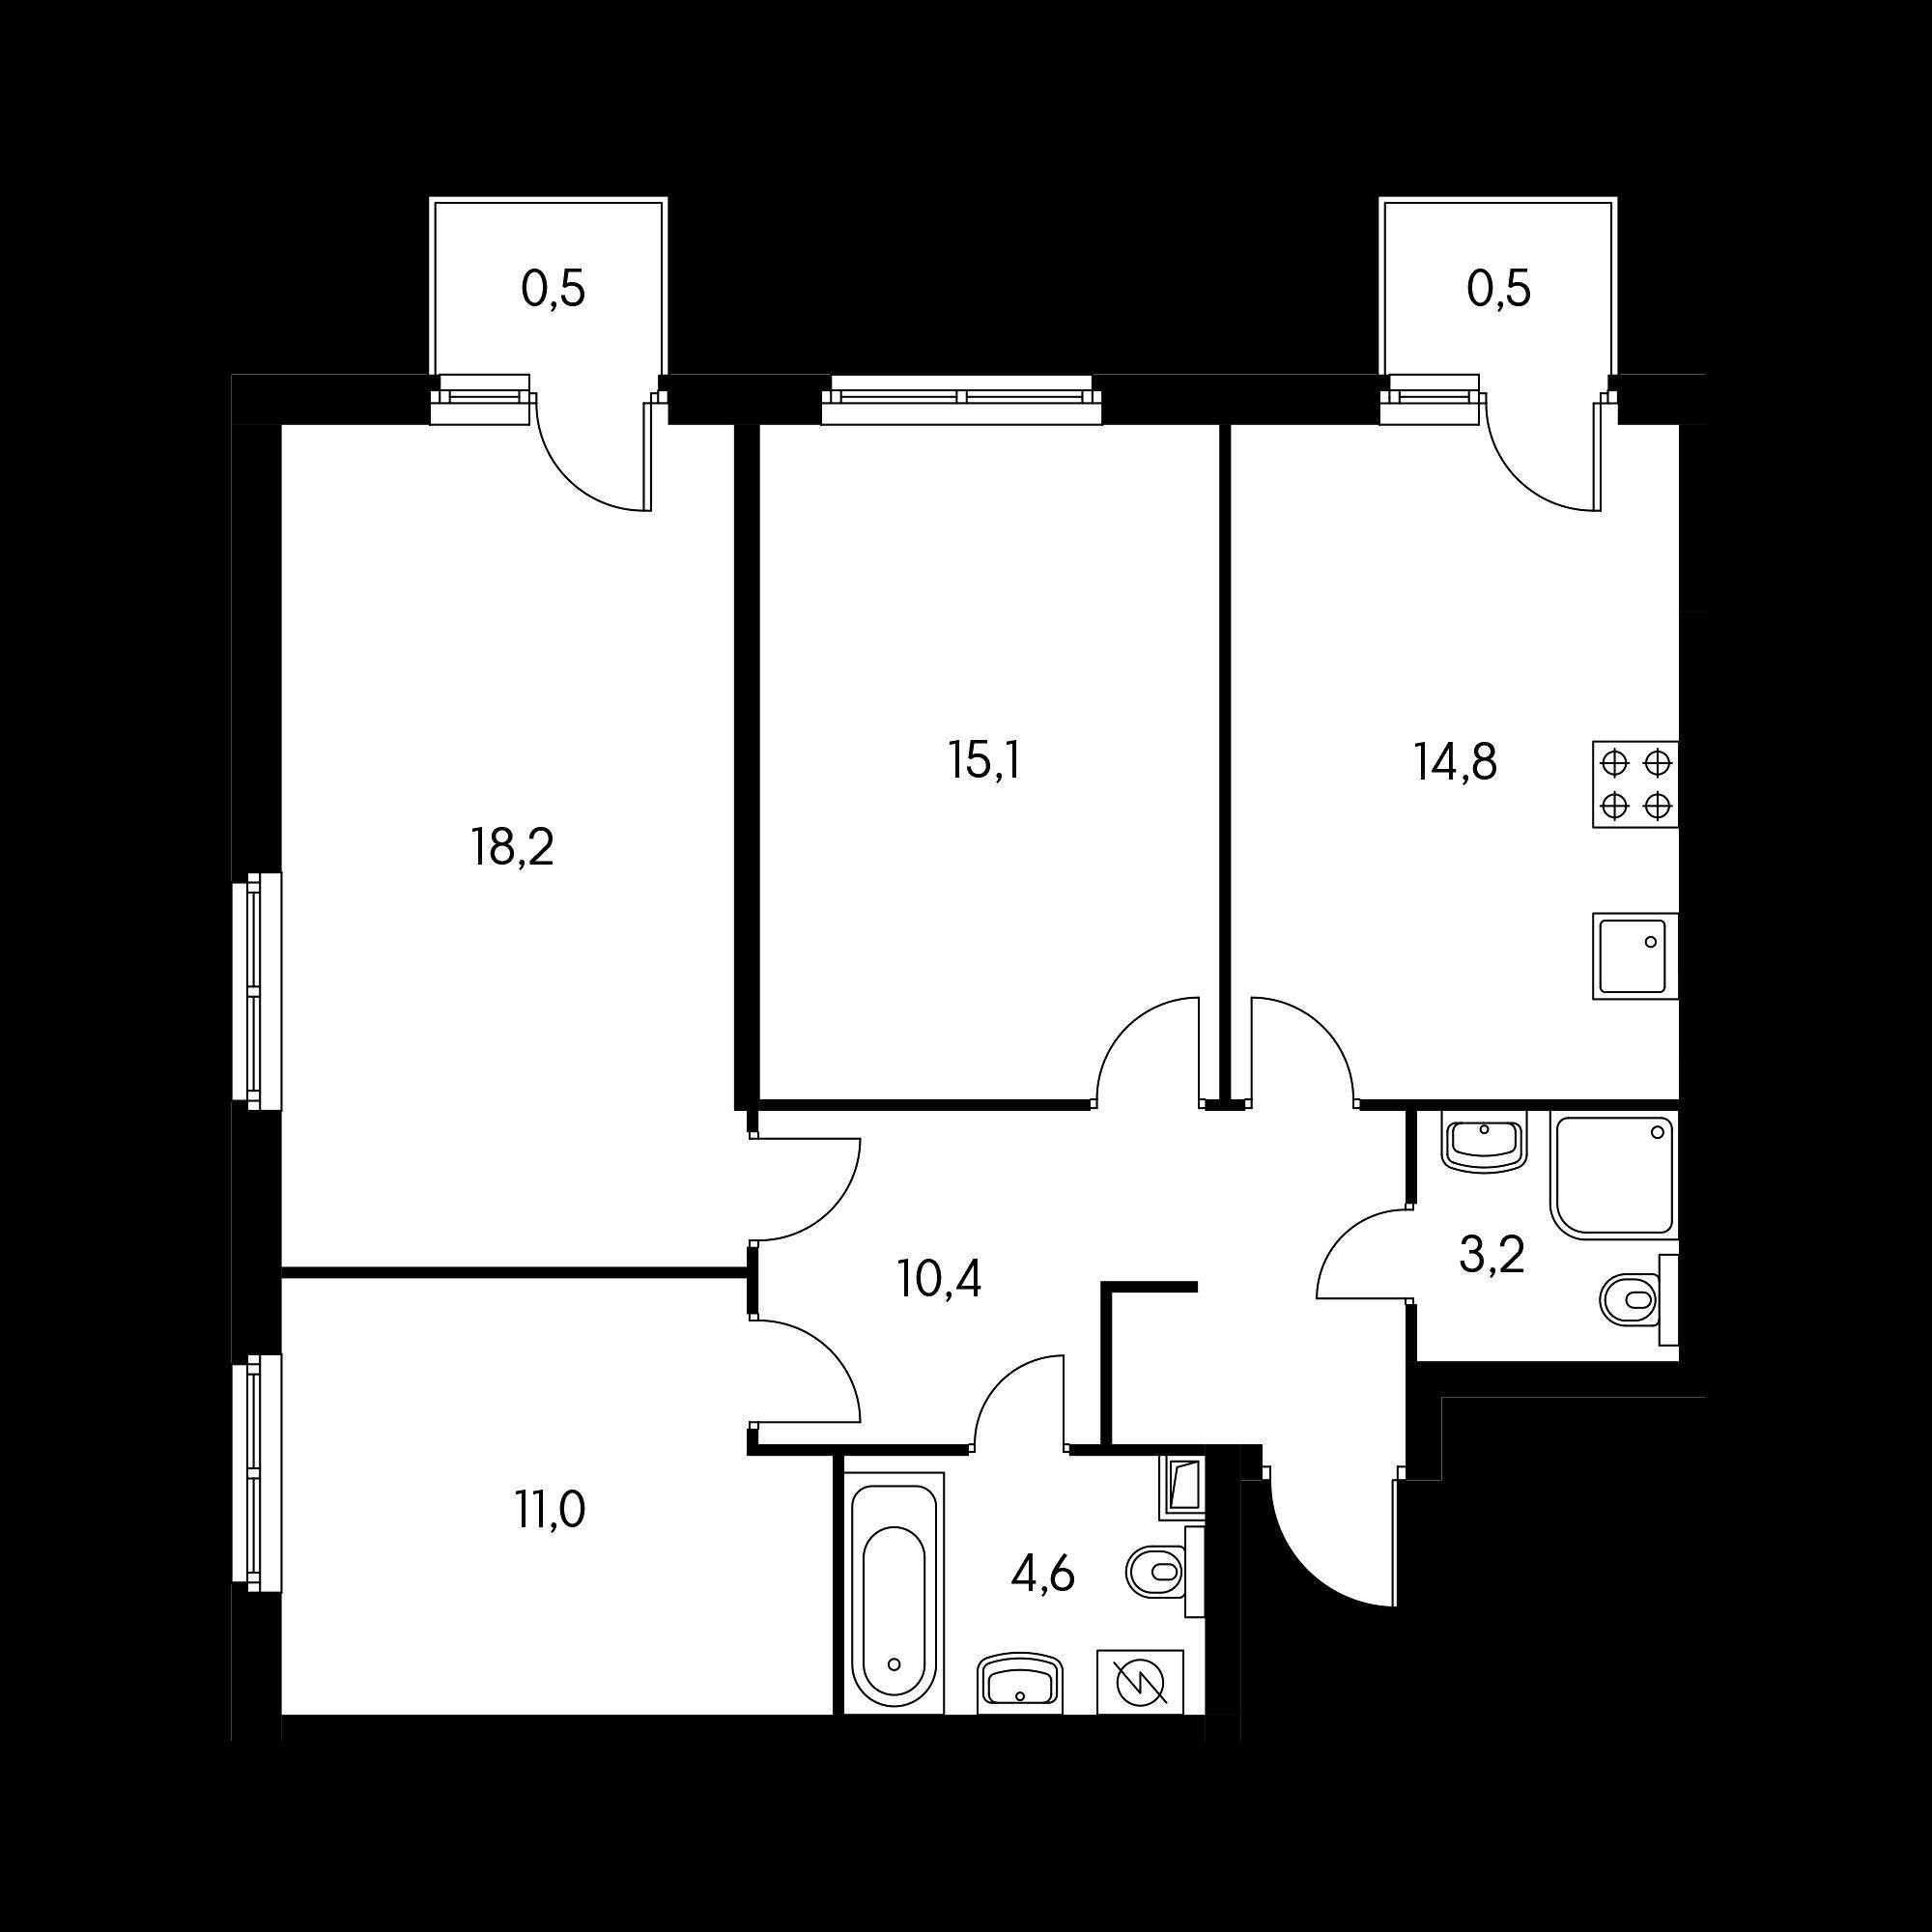 3KM1_B2